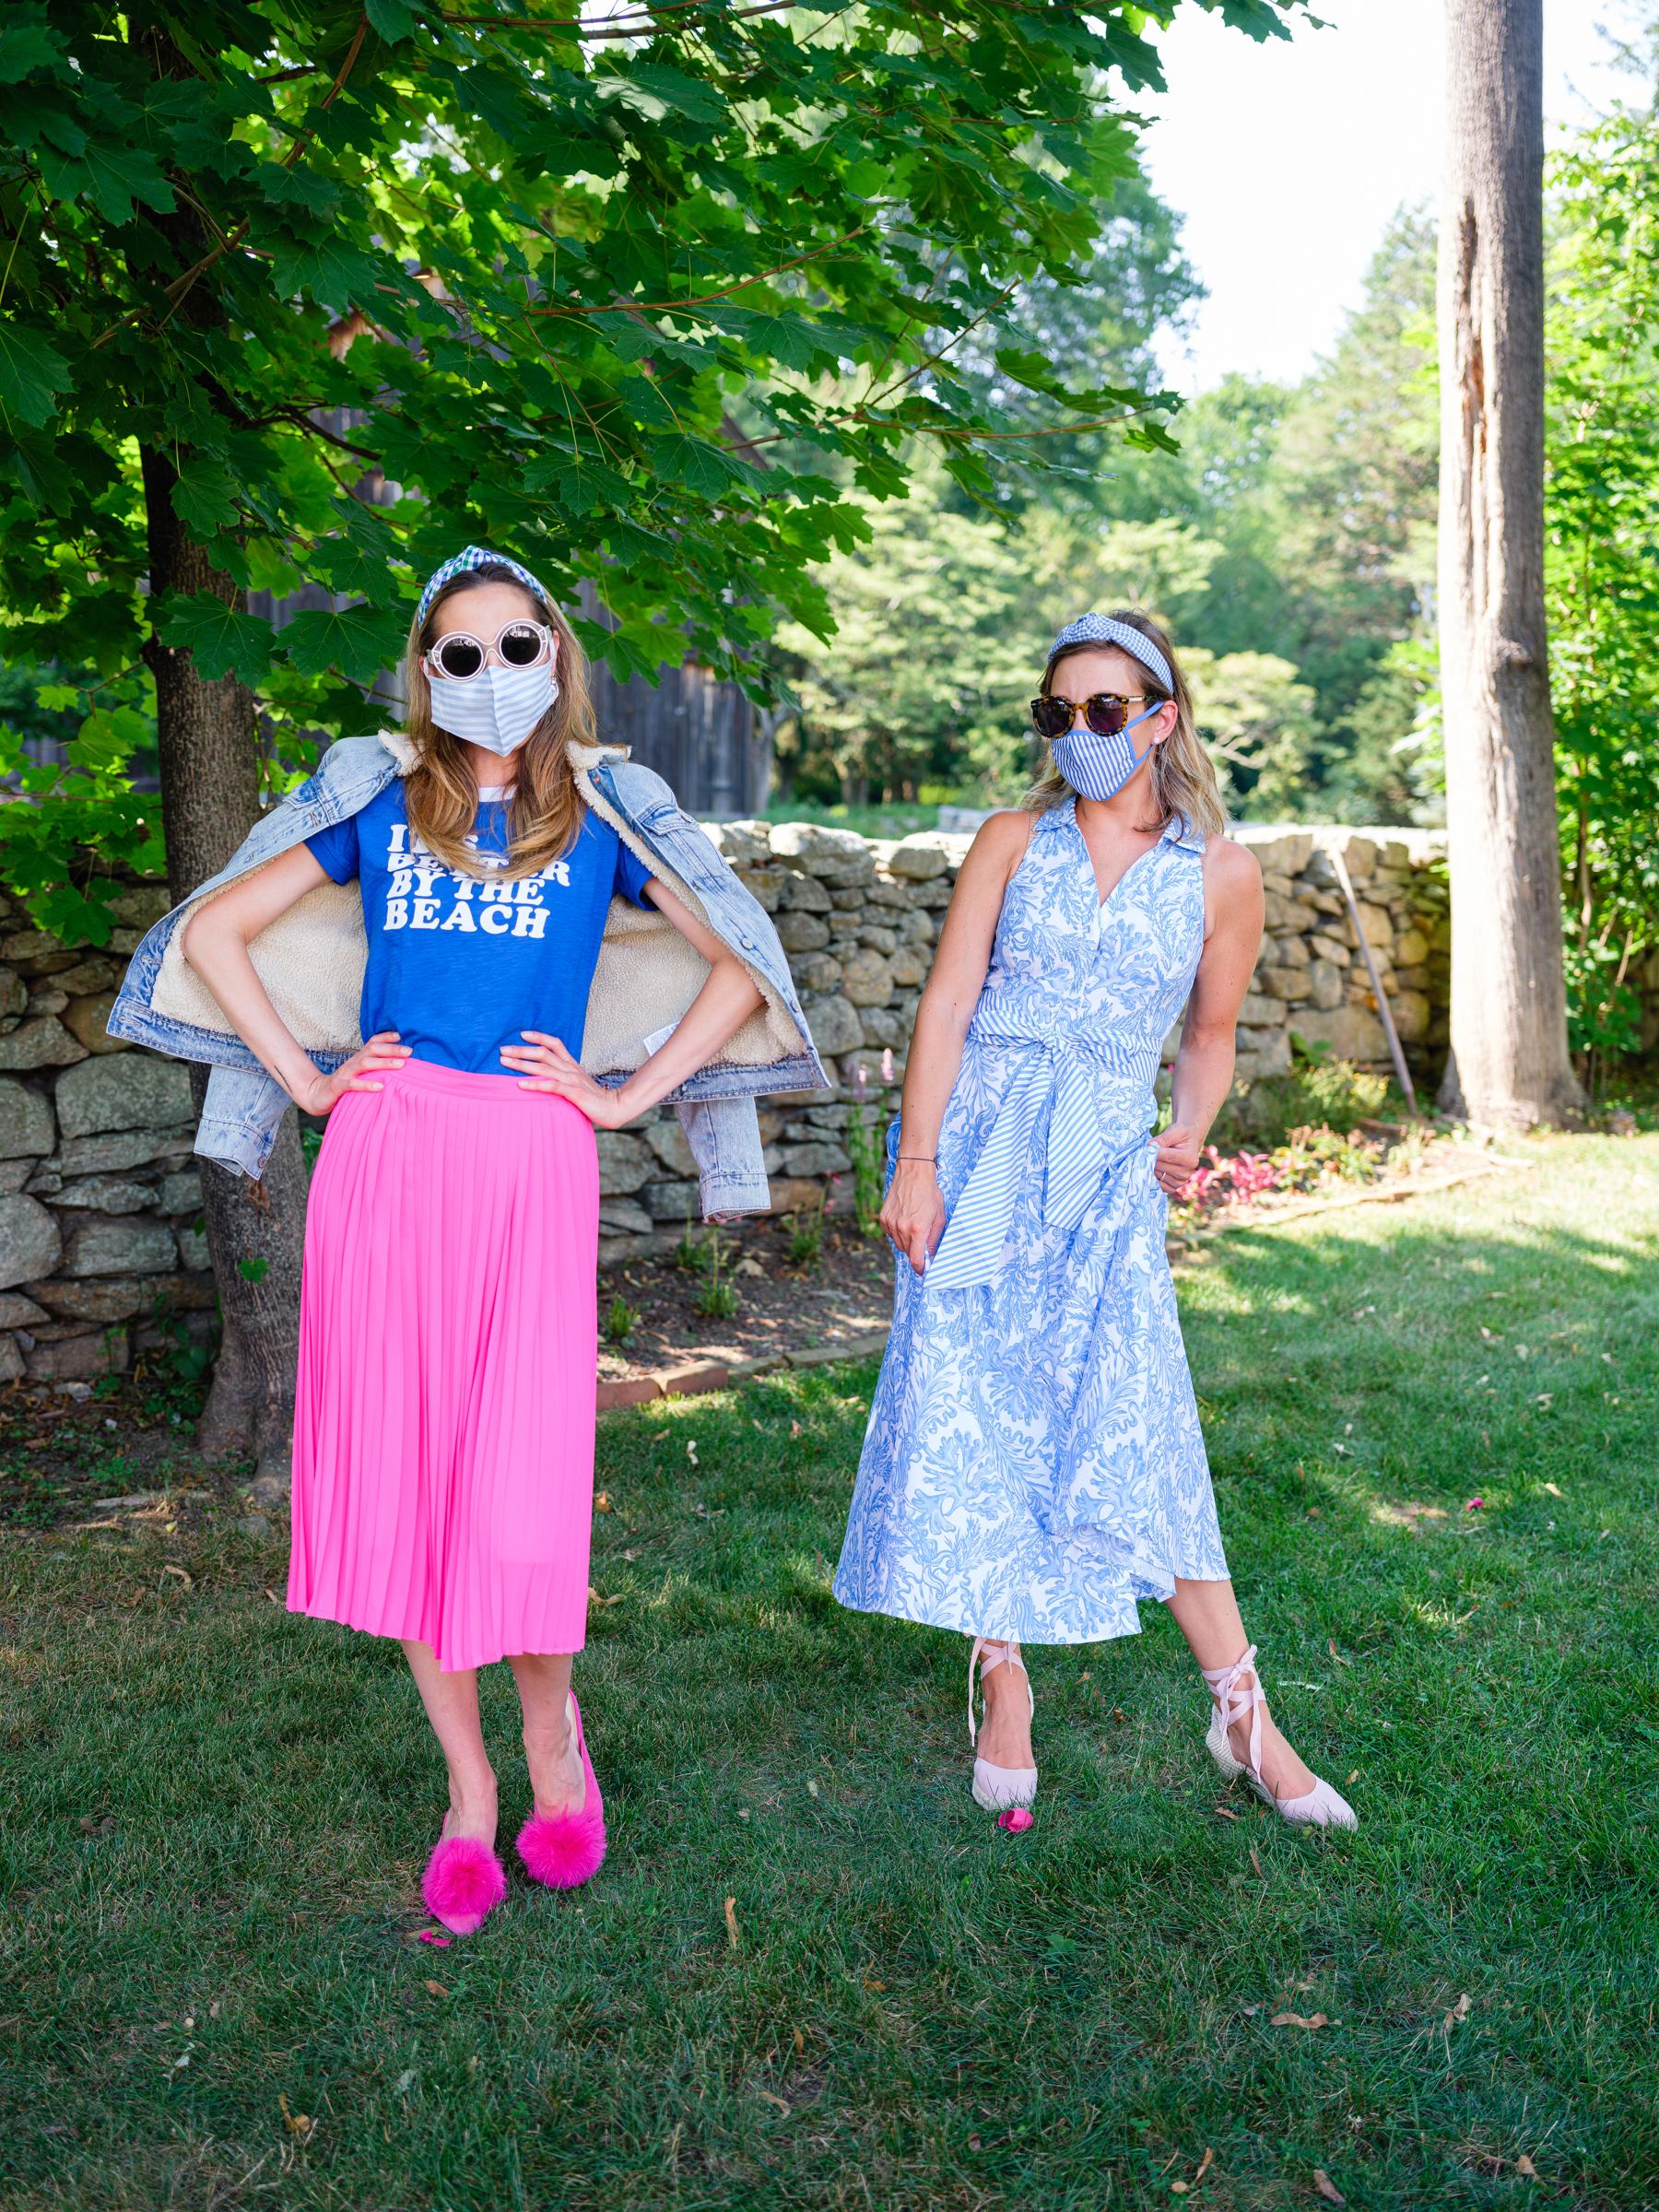 Eva Amurri and Julia Dzafic do an outfit swap